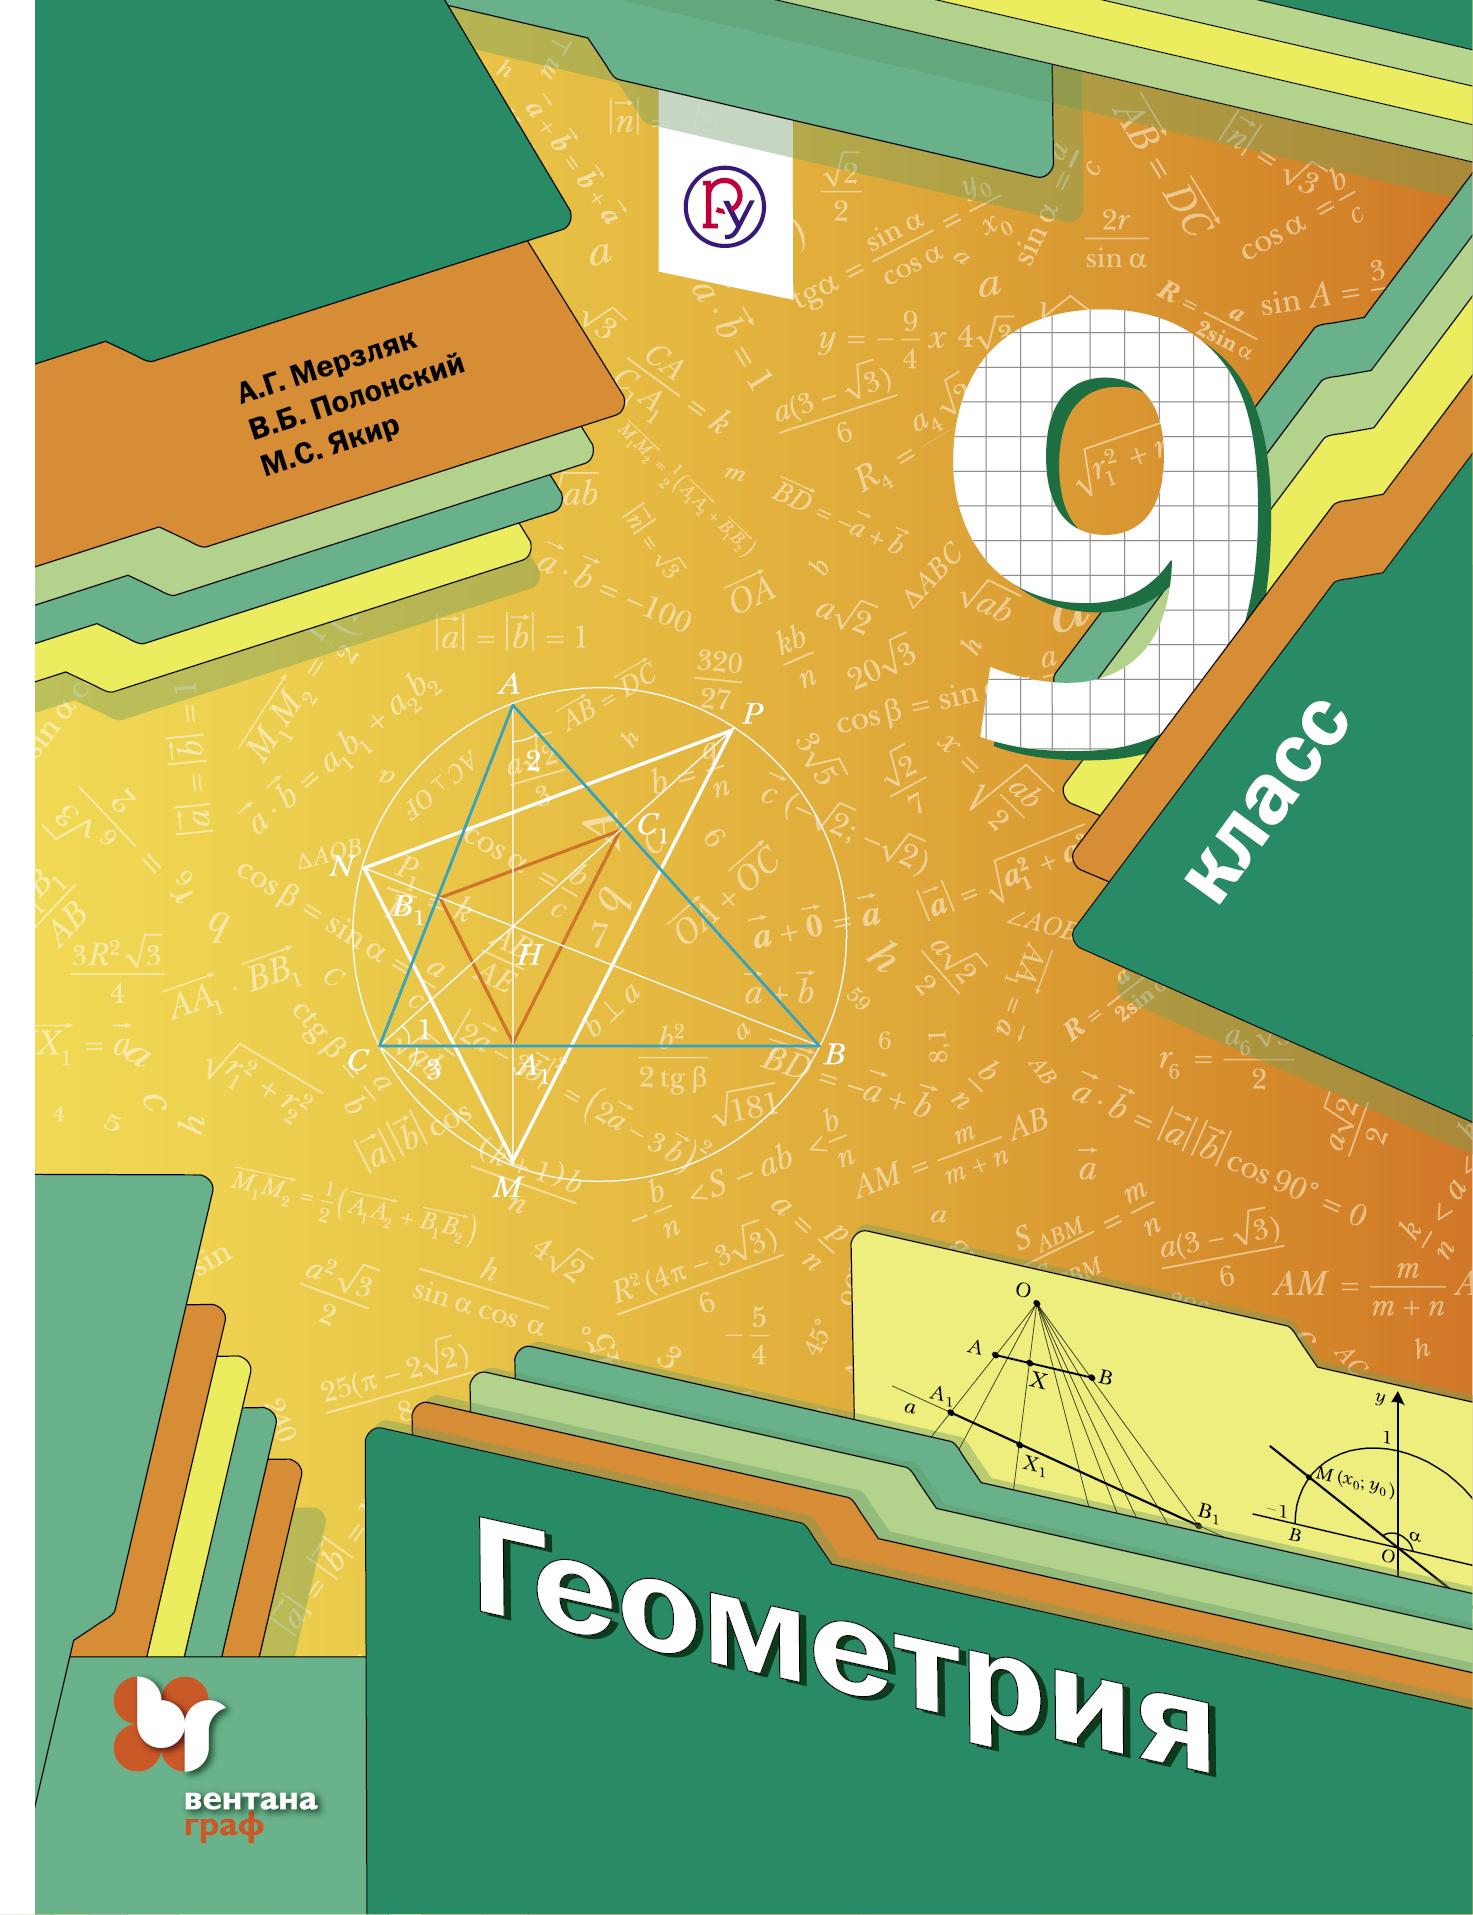 Мерзляк А.Г., Полонский В.Б., Якир М.С. Геометрия. 9класс. Учебник